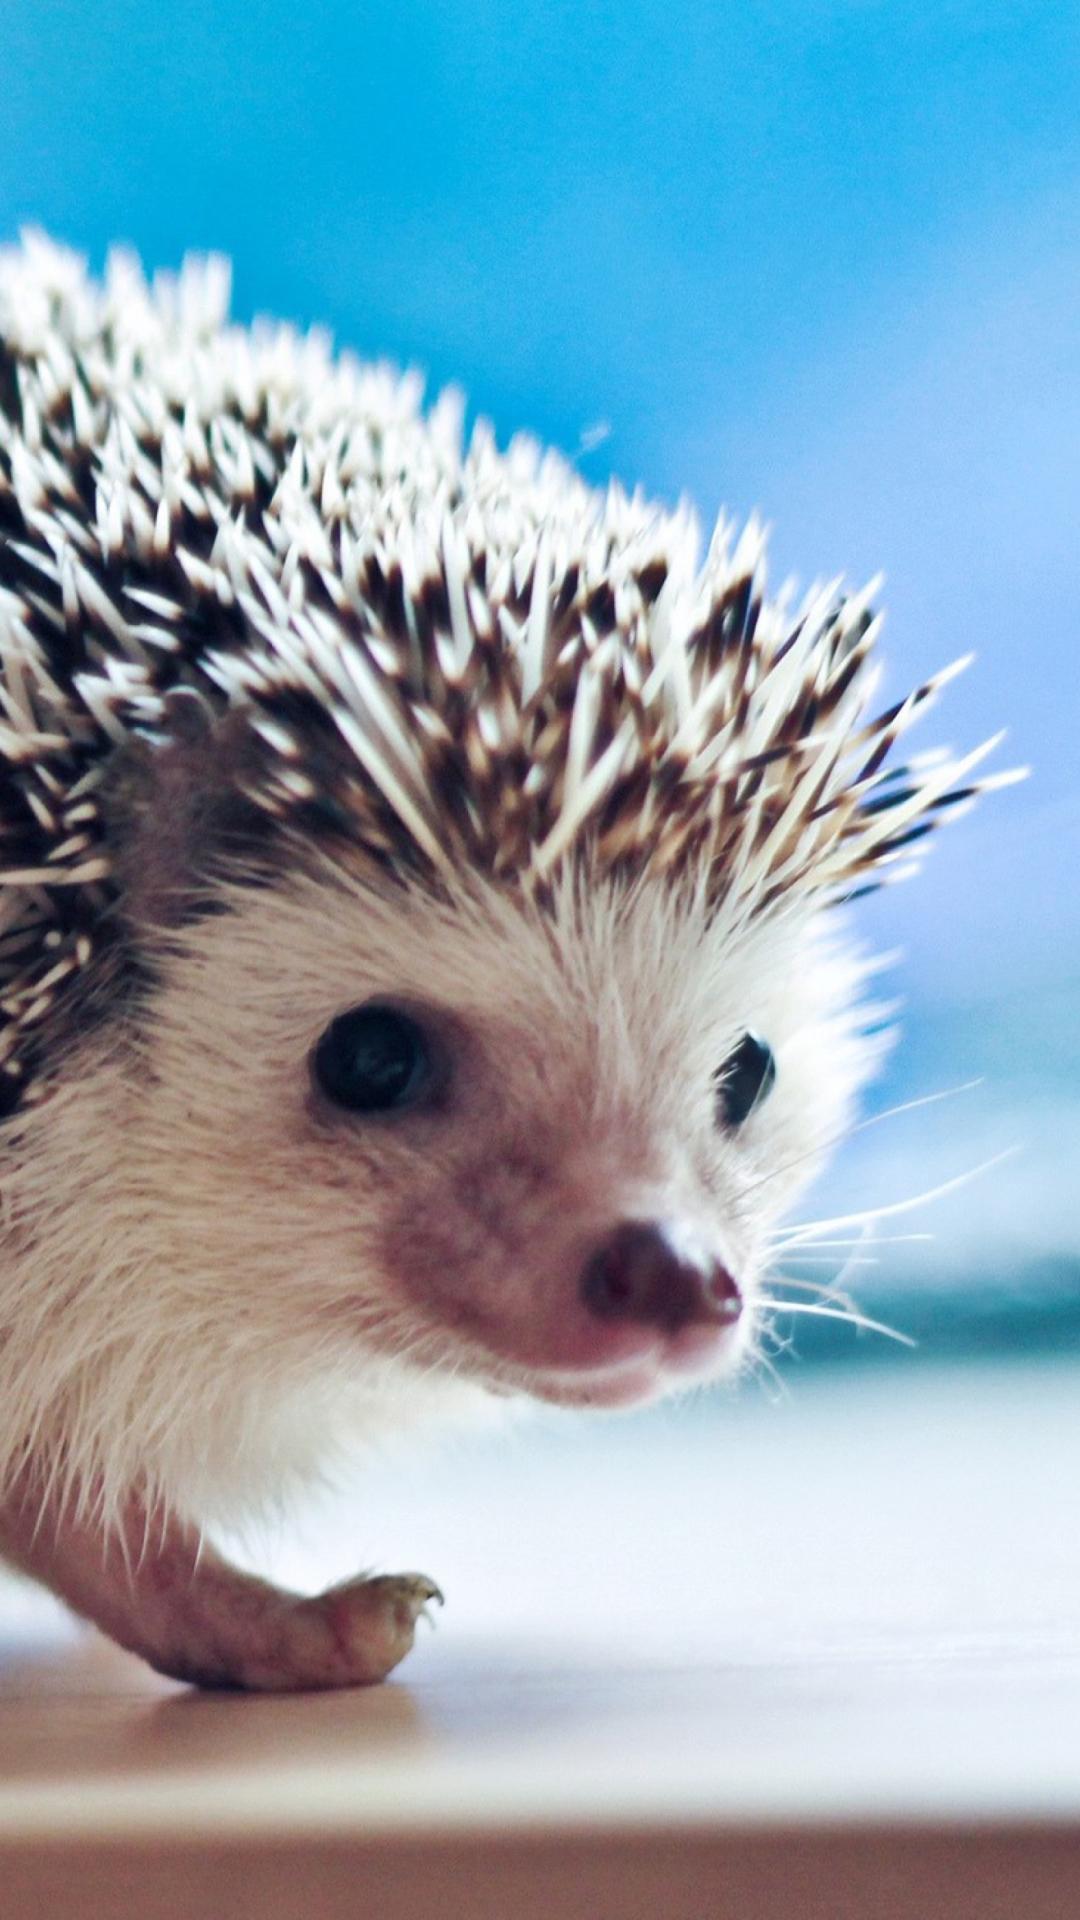 cute hedgehog wallpaper for iphone 6 plus